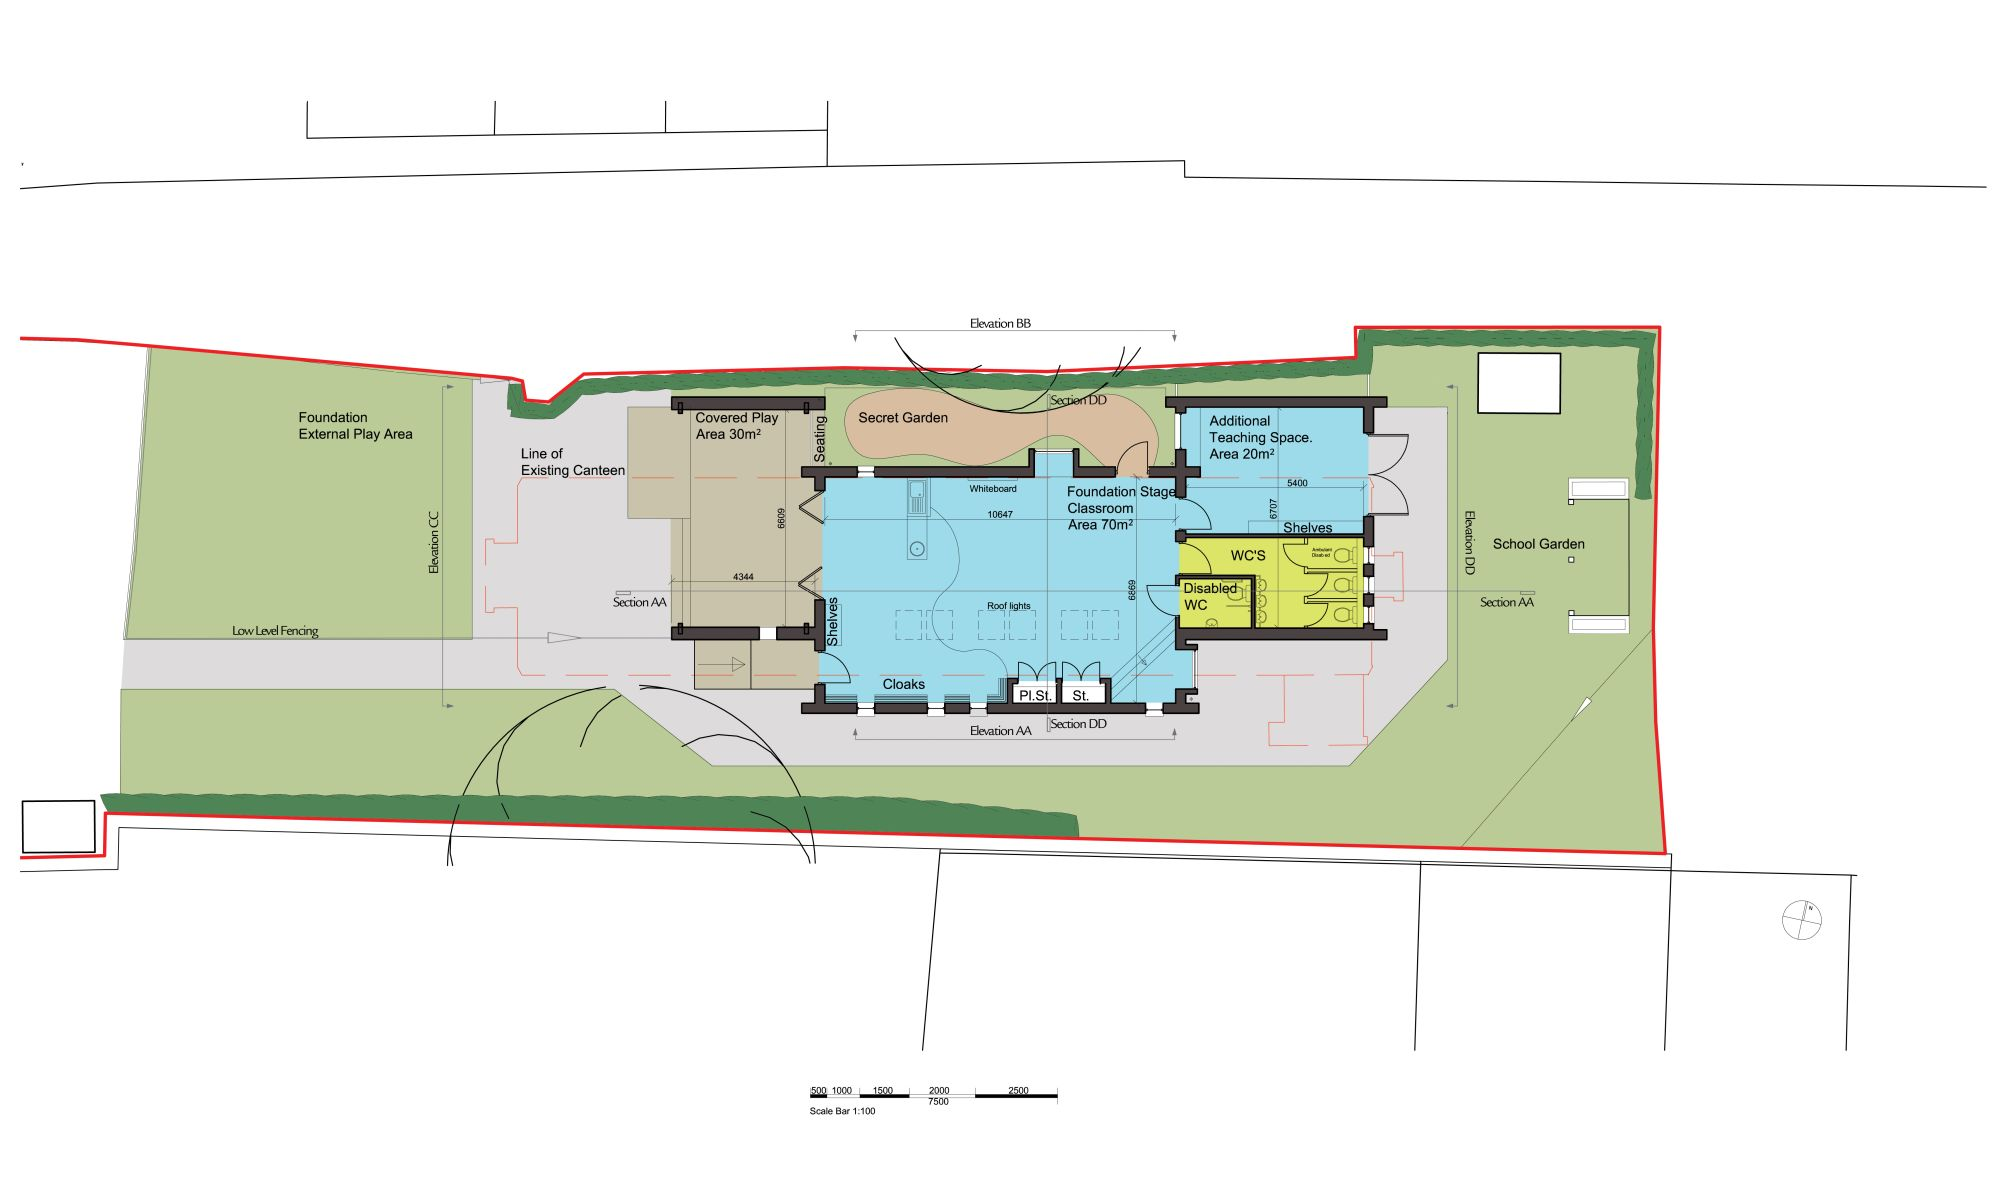 Interior design contemporary children zone plan and sketch also layout information plus measure room friendly · school buildinglandscaping